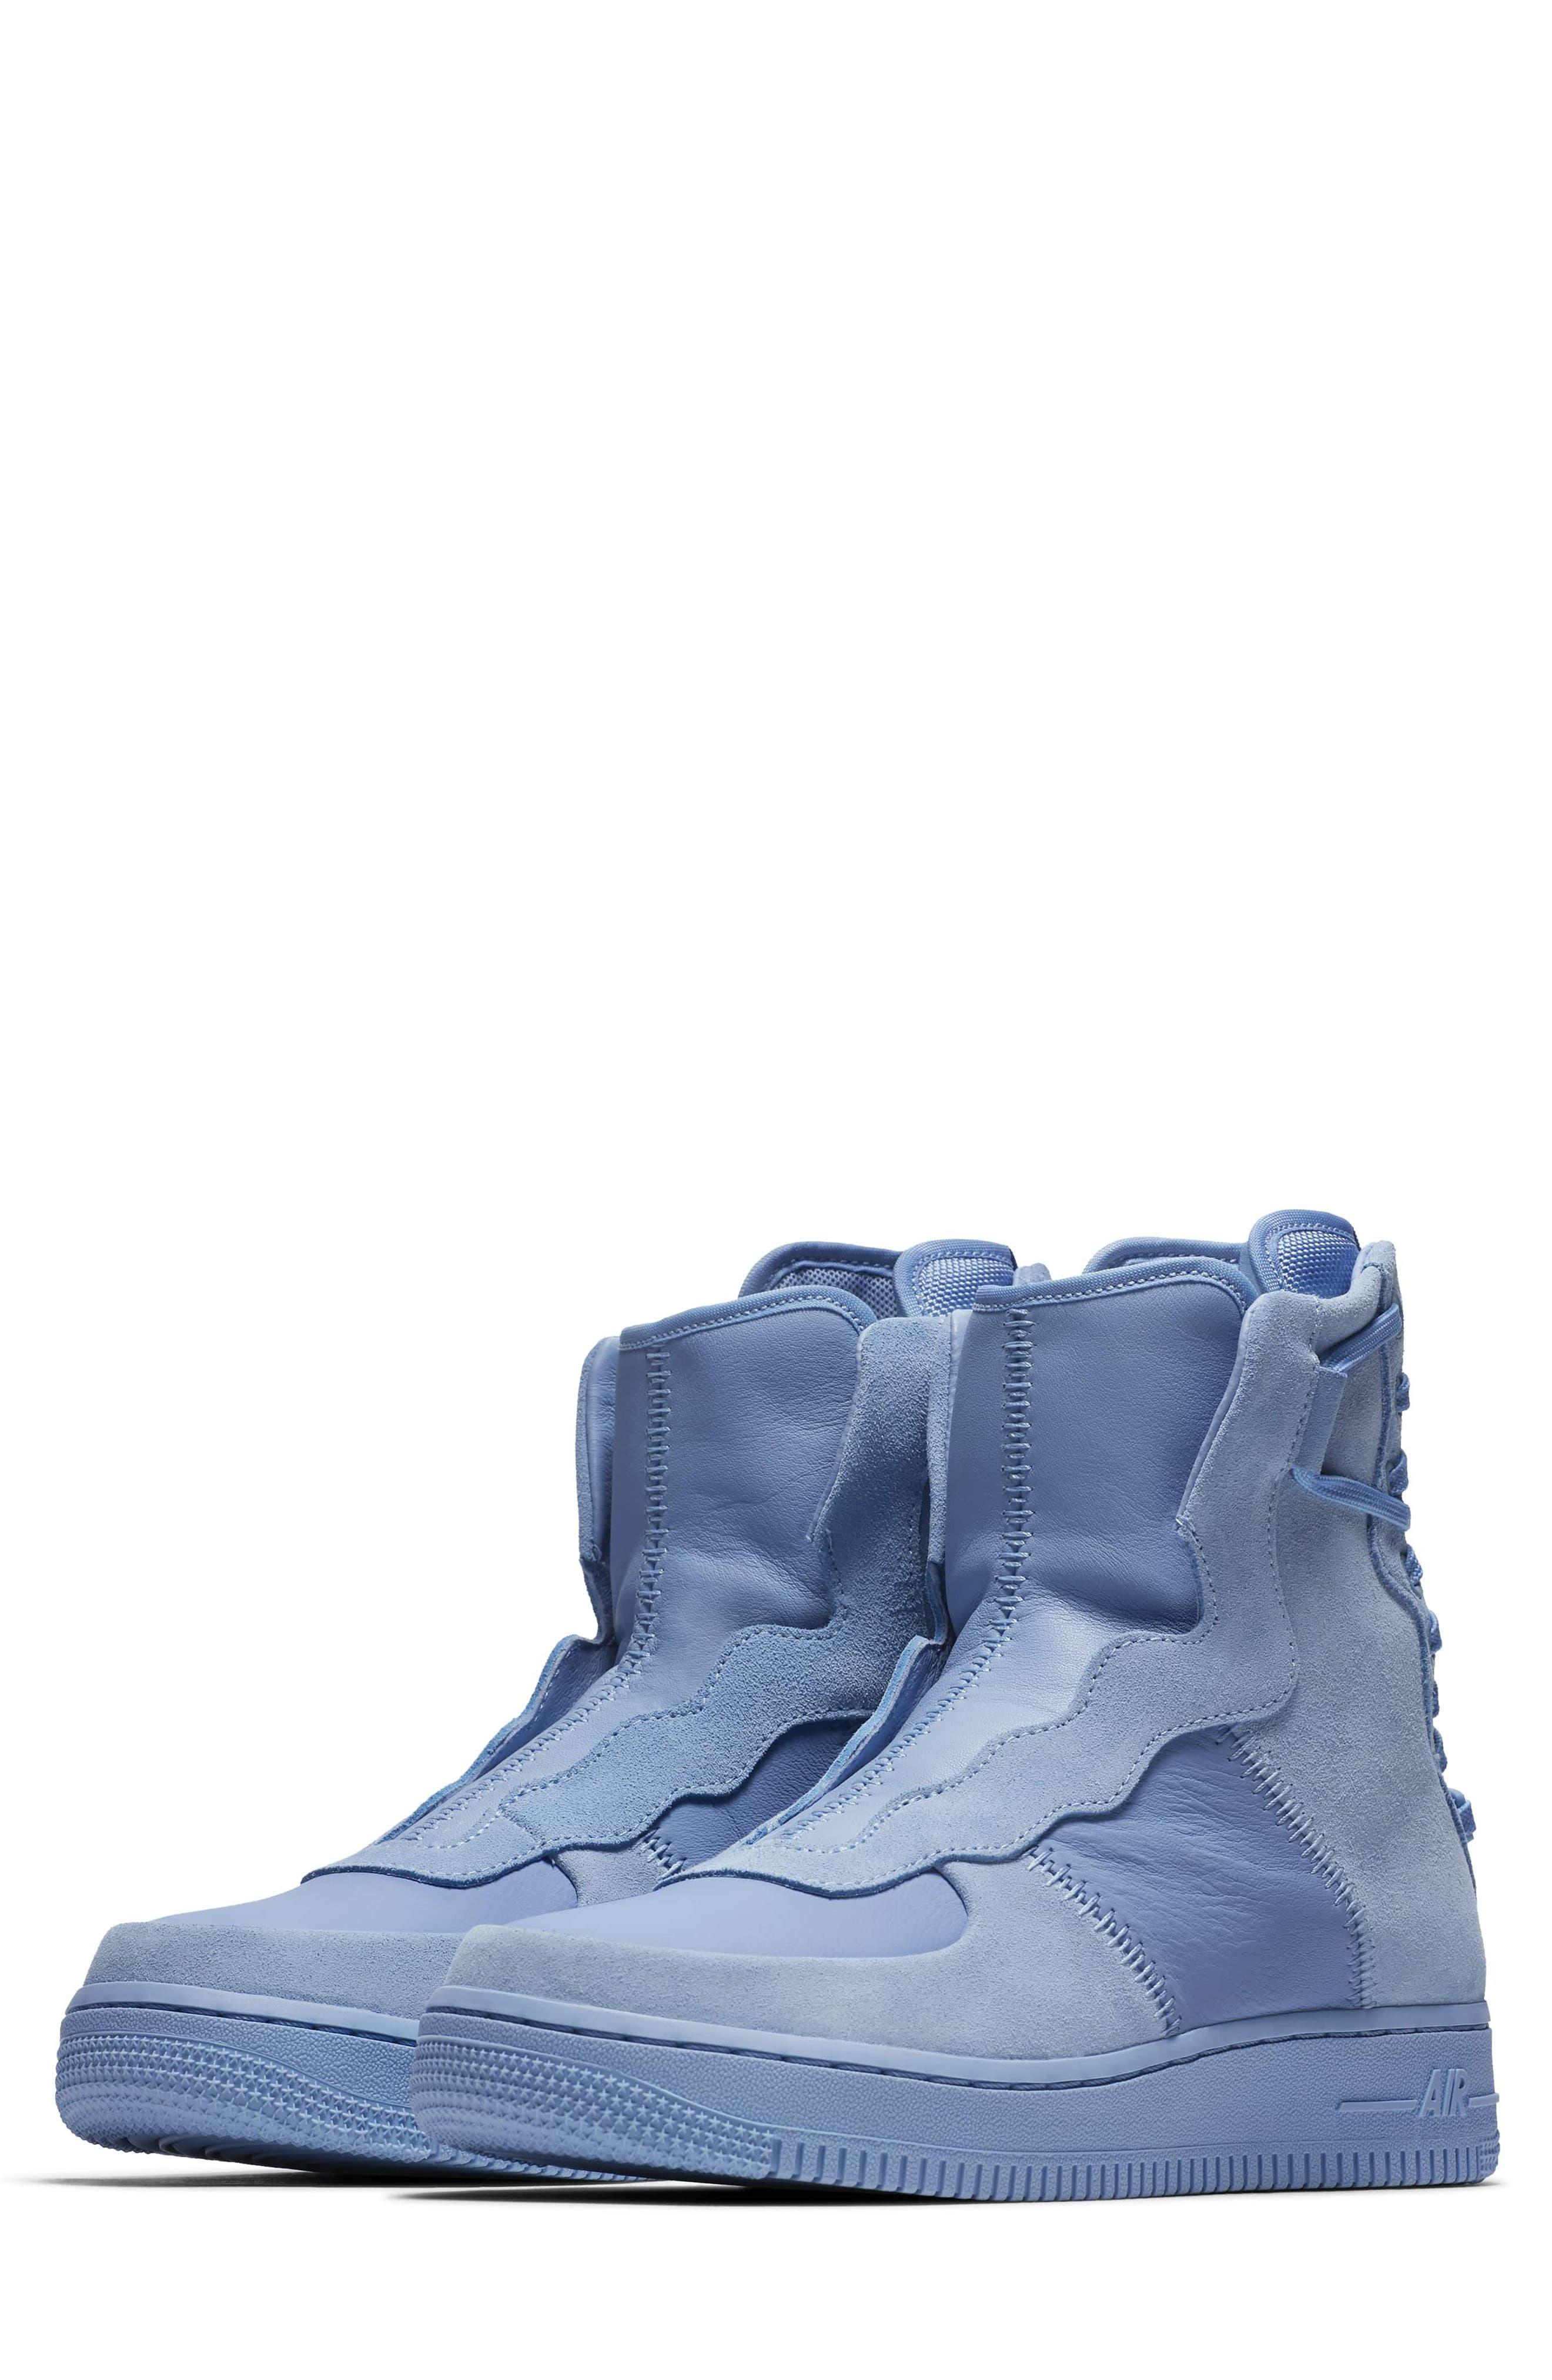 Air Force 1 Rebel XX High Top Sneaker,                             Main thumbnail 1, color,                             Light Blue